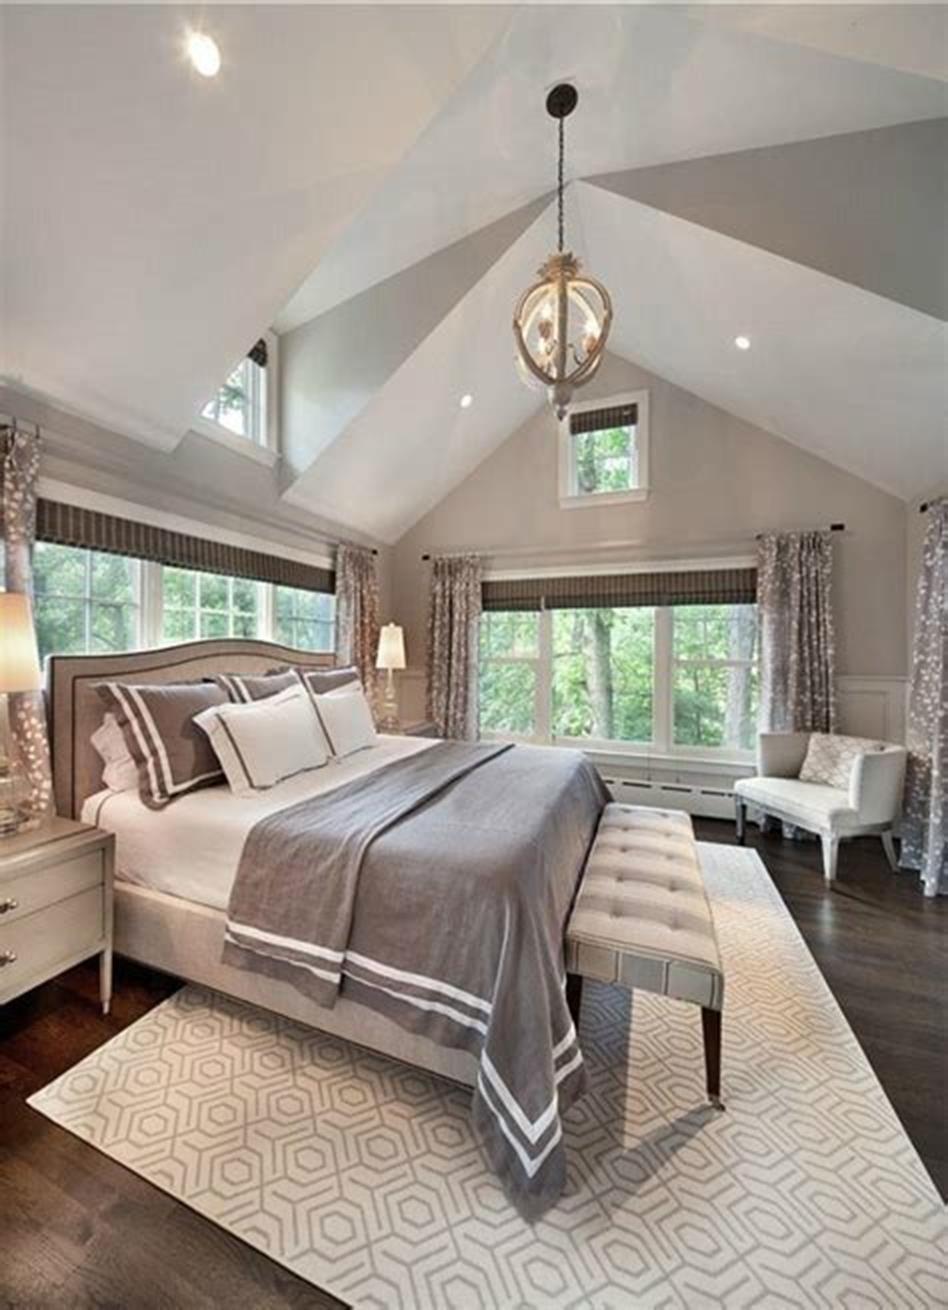 30 Romantic Cozy Master Bedroom Decorating Ideas 2019 52 Master Bedrooms Decor Home Bedroom Remodel Bedroom